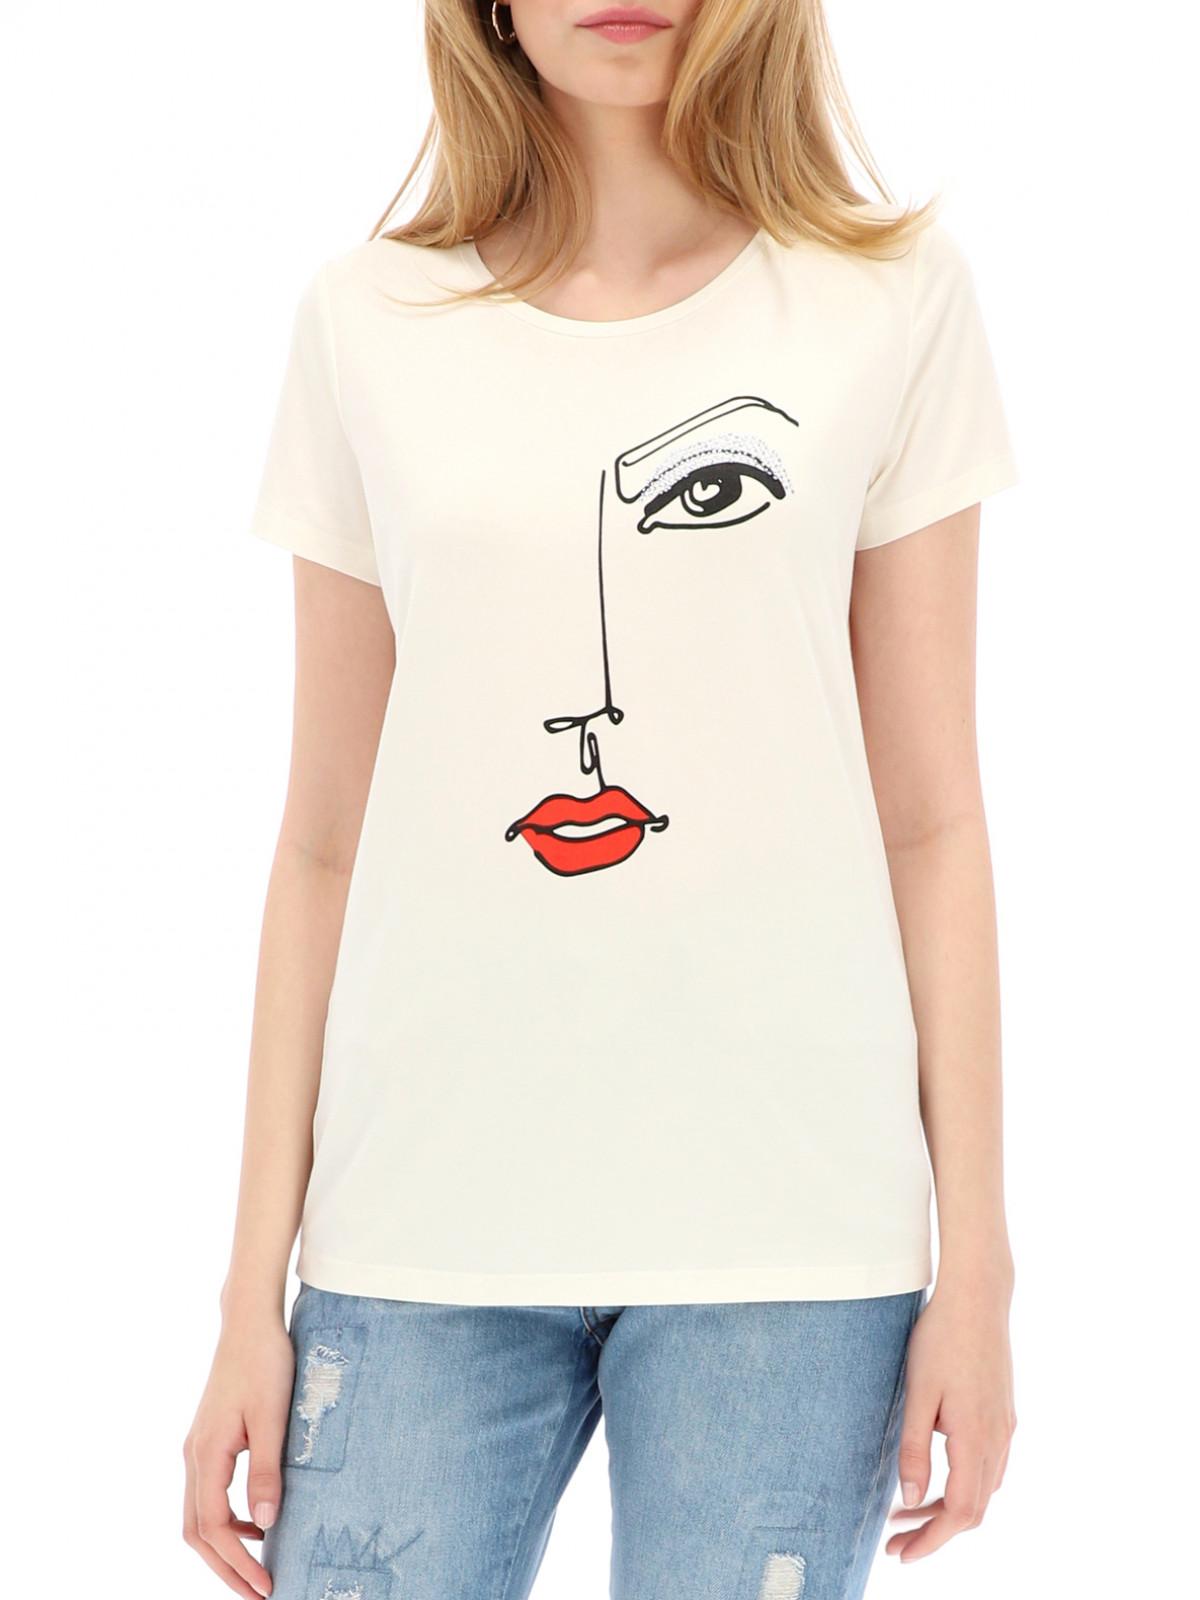 https://eyeforfashion.pl/product/7998/t-shirt-z-nadrukiem-twarzy-kobiety-potis-verso-libra